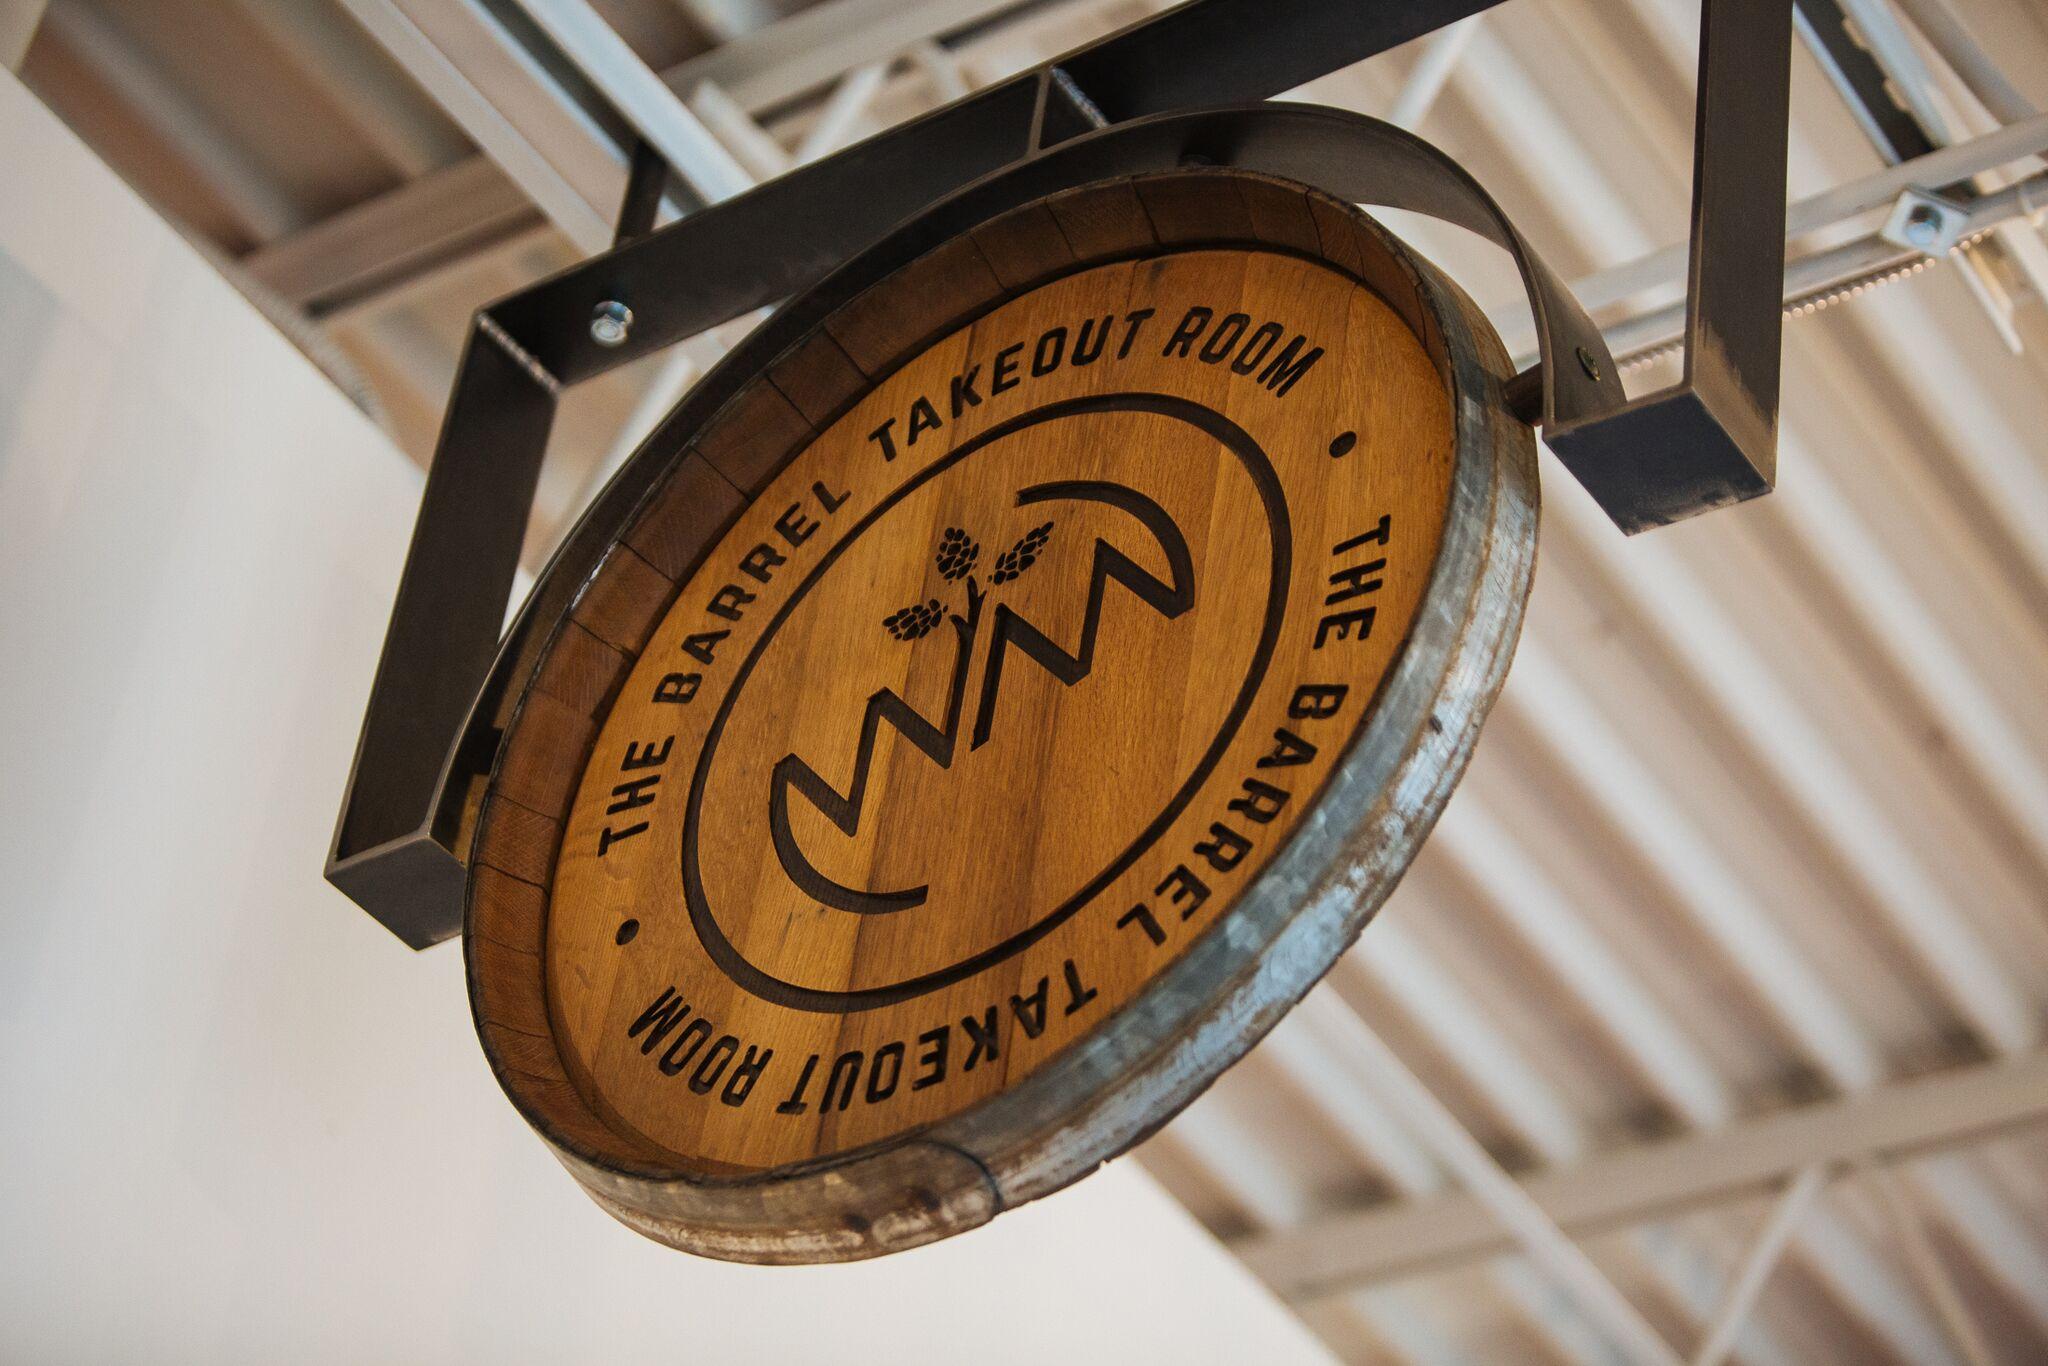 Wild Mind Artisan Ales - The Barrel Takeout Room Sign.jpeg